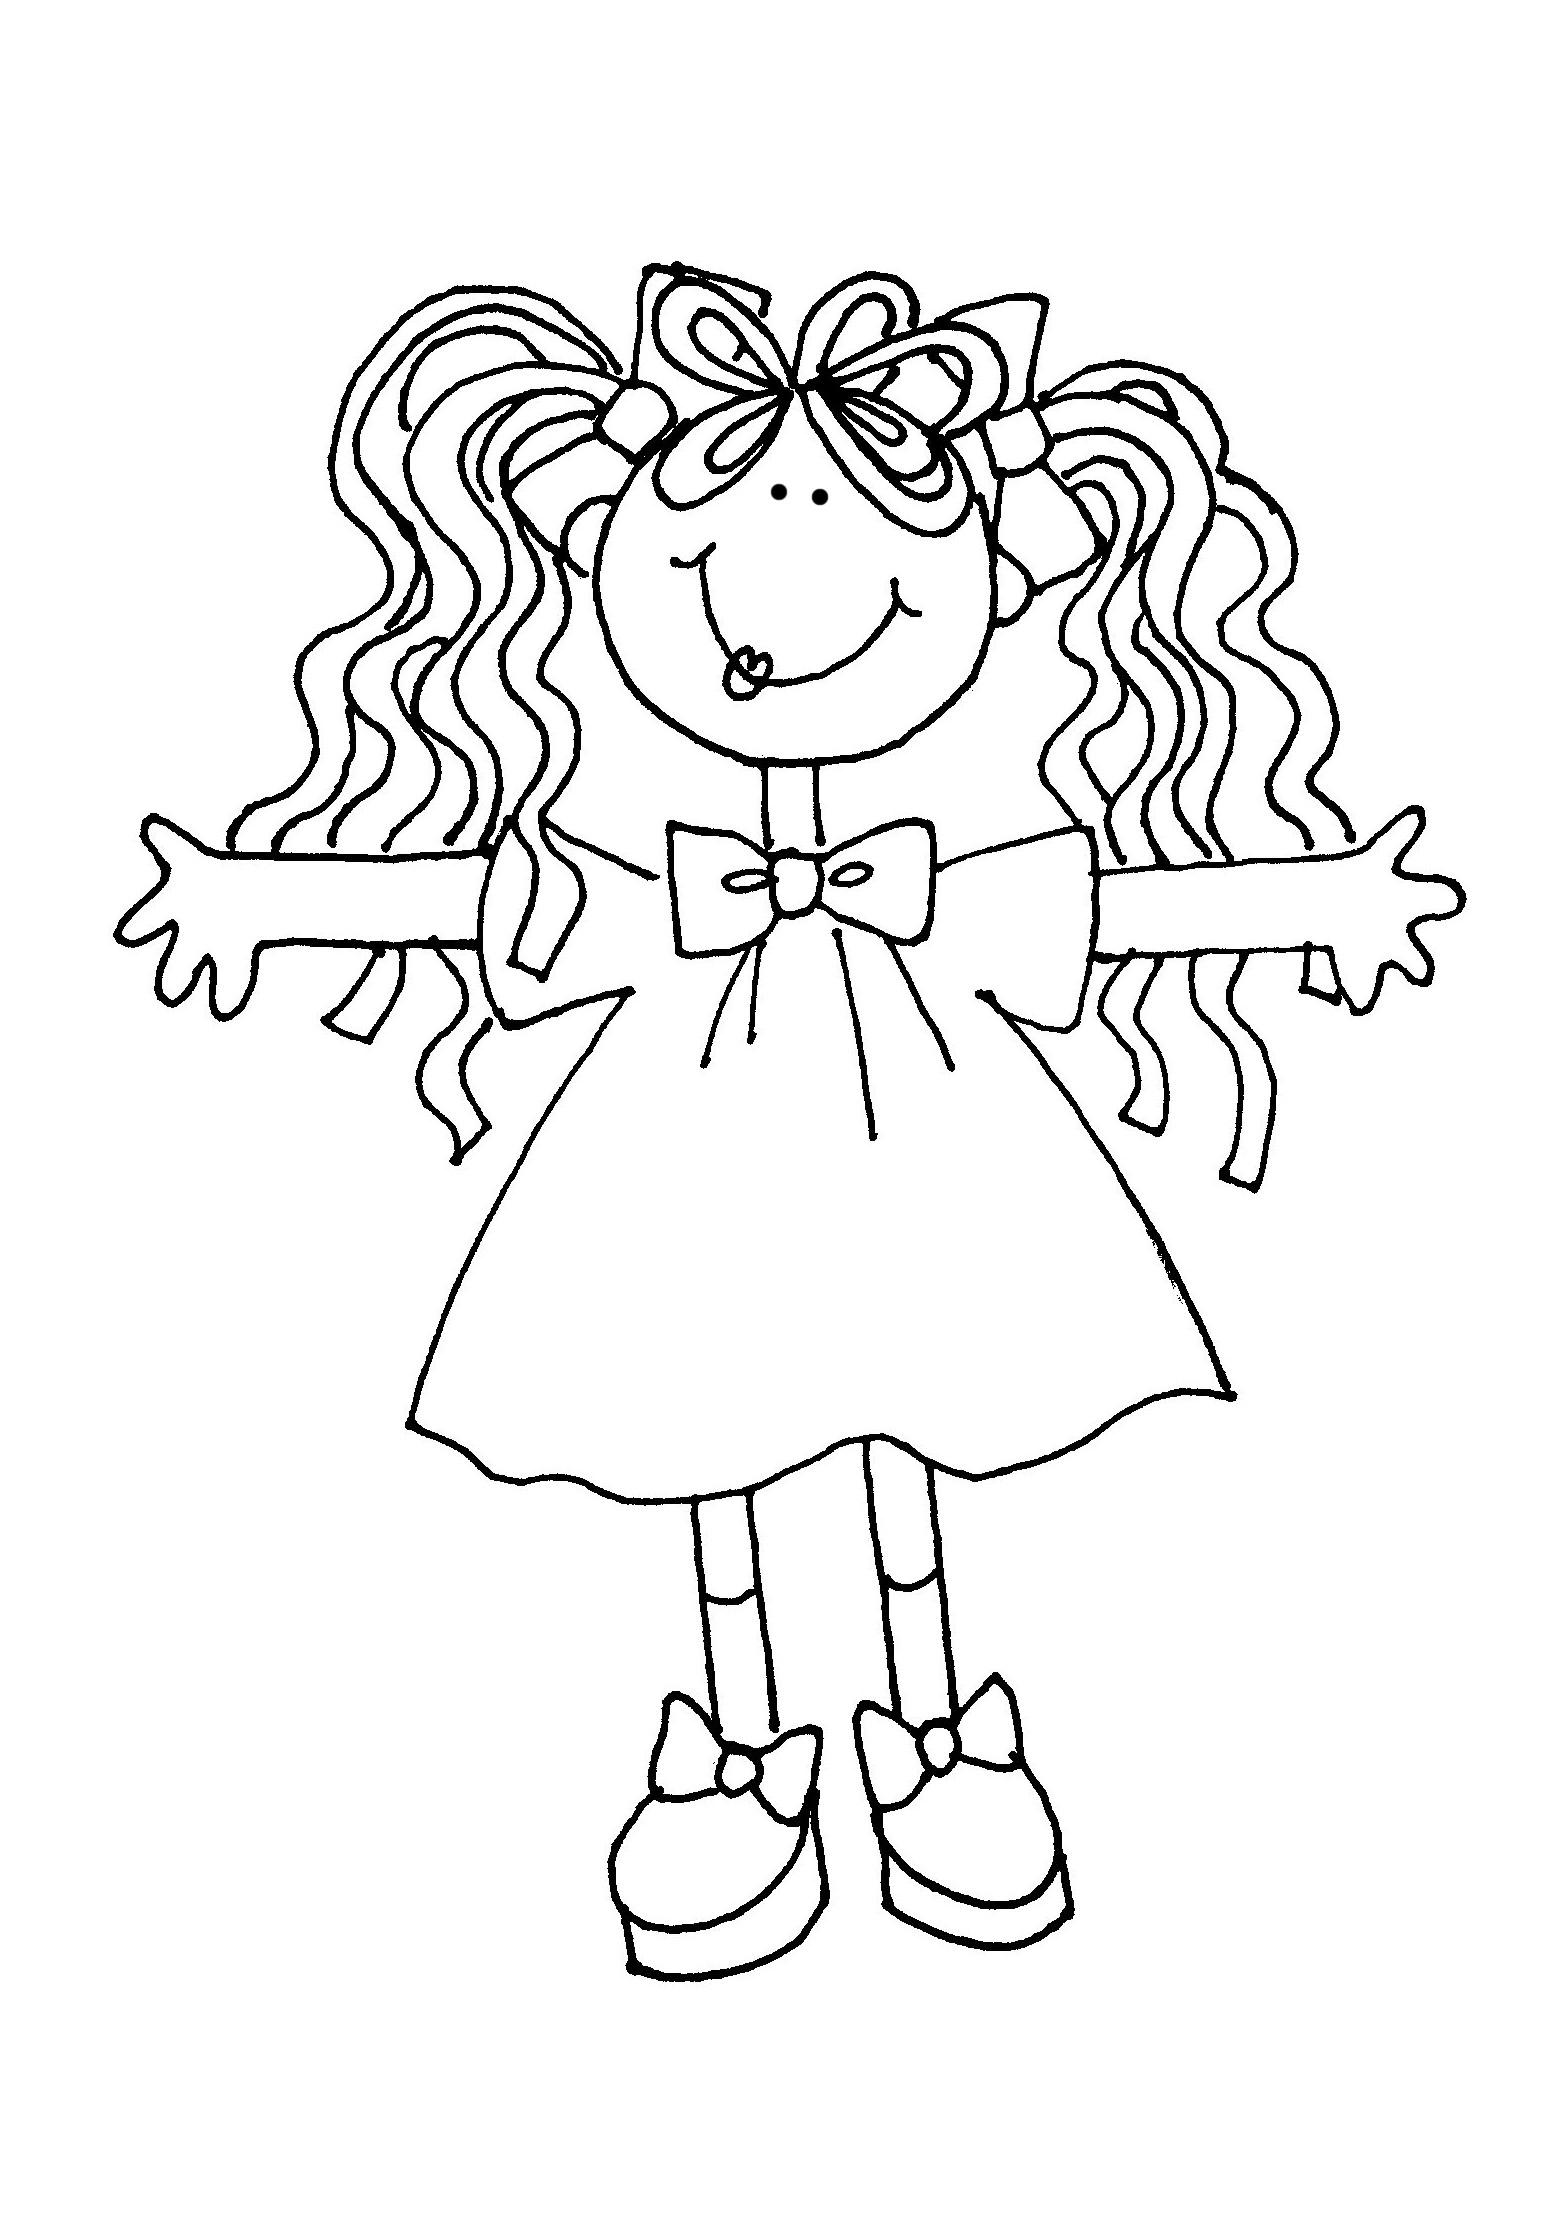 Pin de Gramma Joy en Doodle Kidlets   Pinterest   Bordado, Dibujo y ...